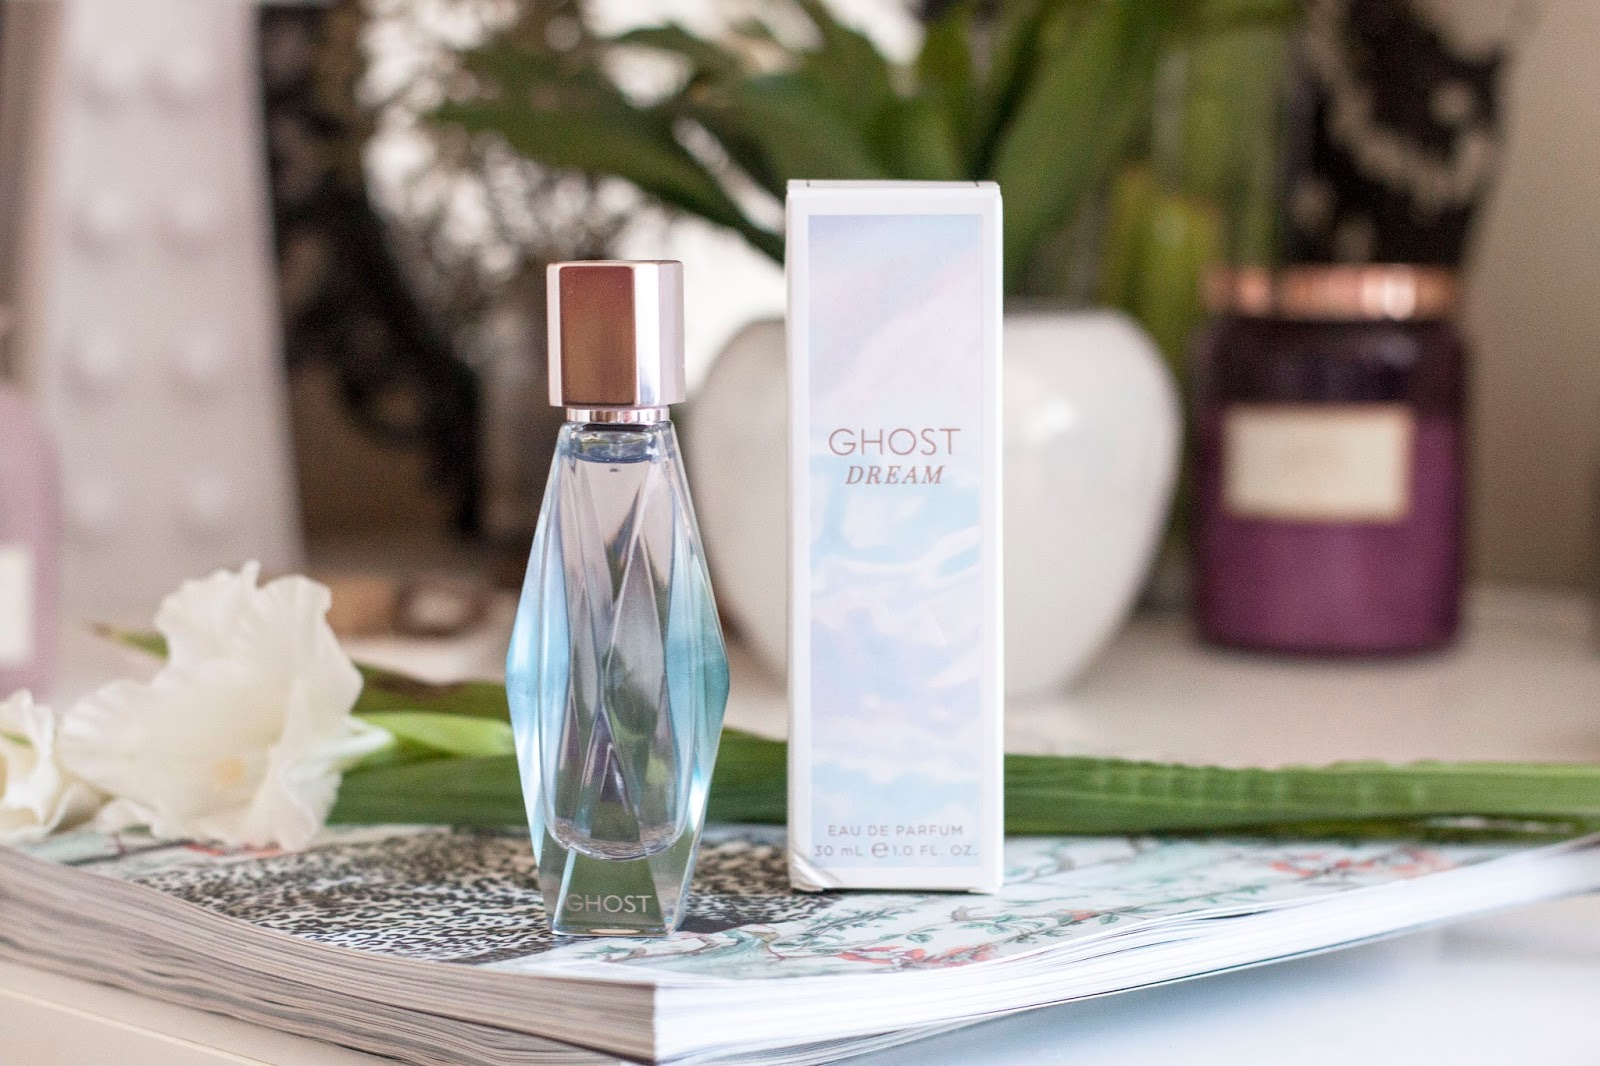 Image of Ghost Dream perfume